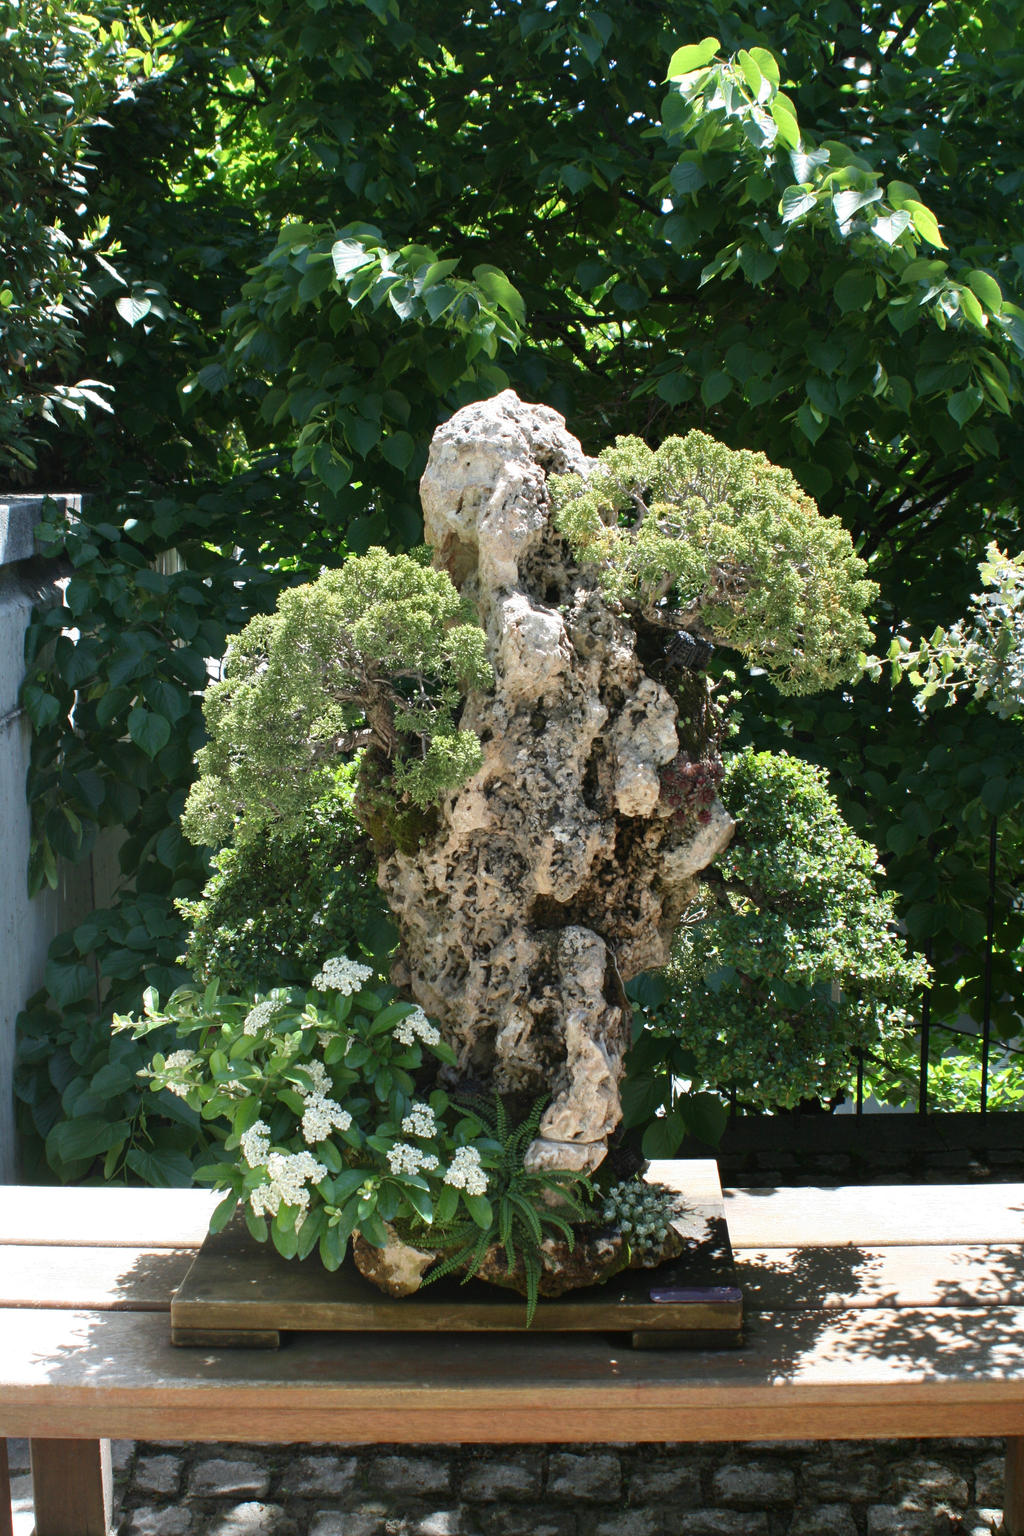 Bonsai from real jardin botanico de madrid by khetry on for Jardin botanico madrid